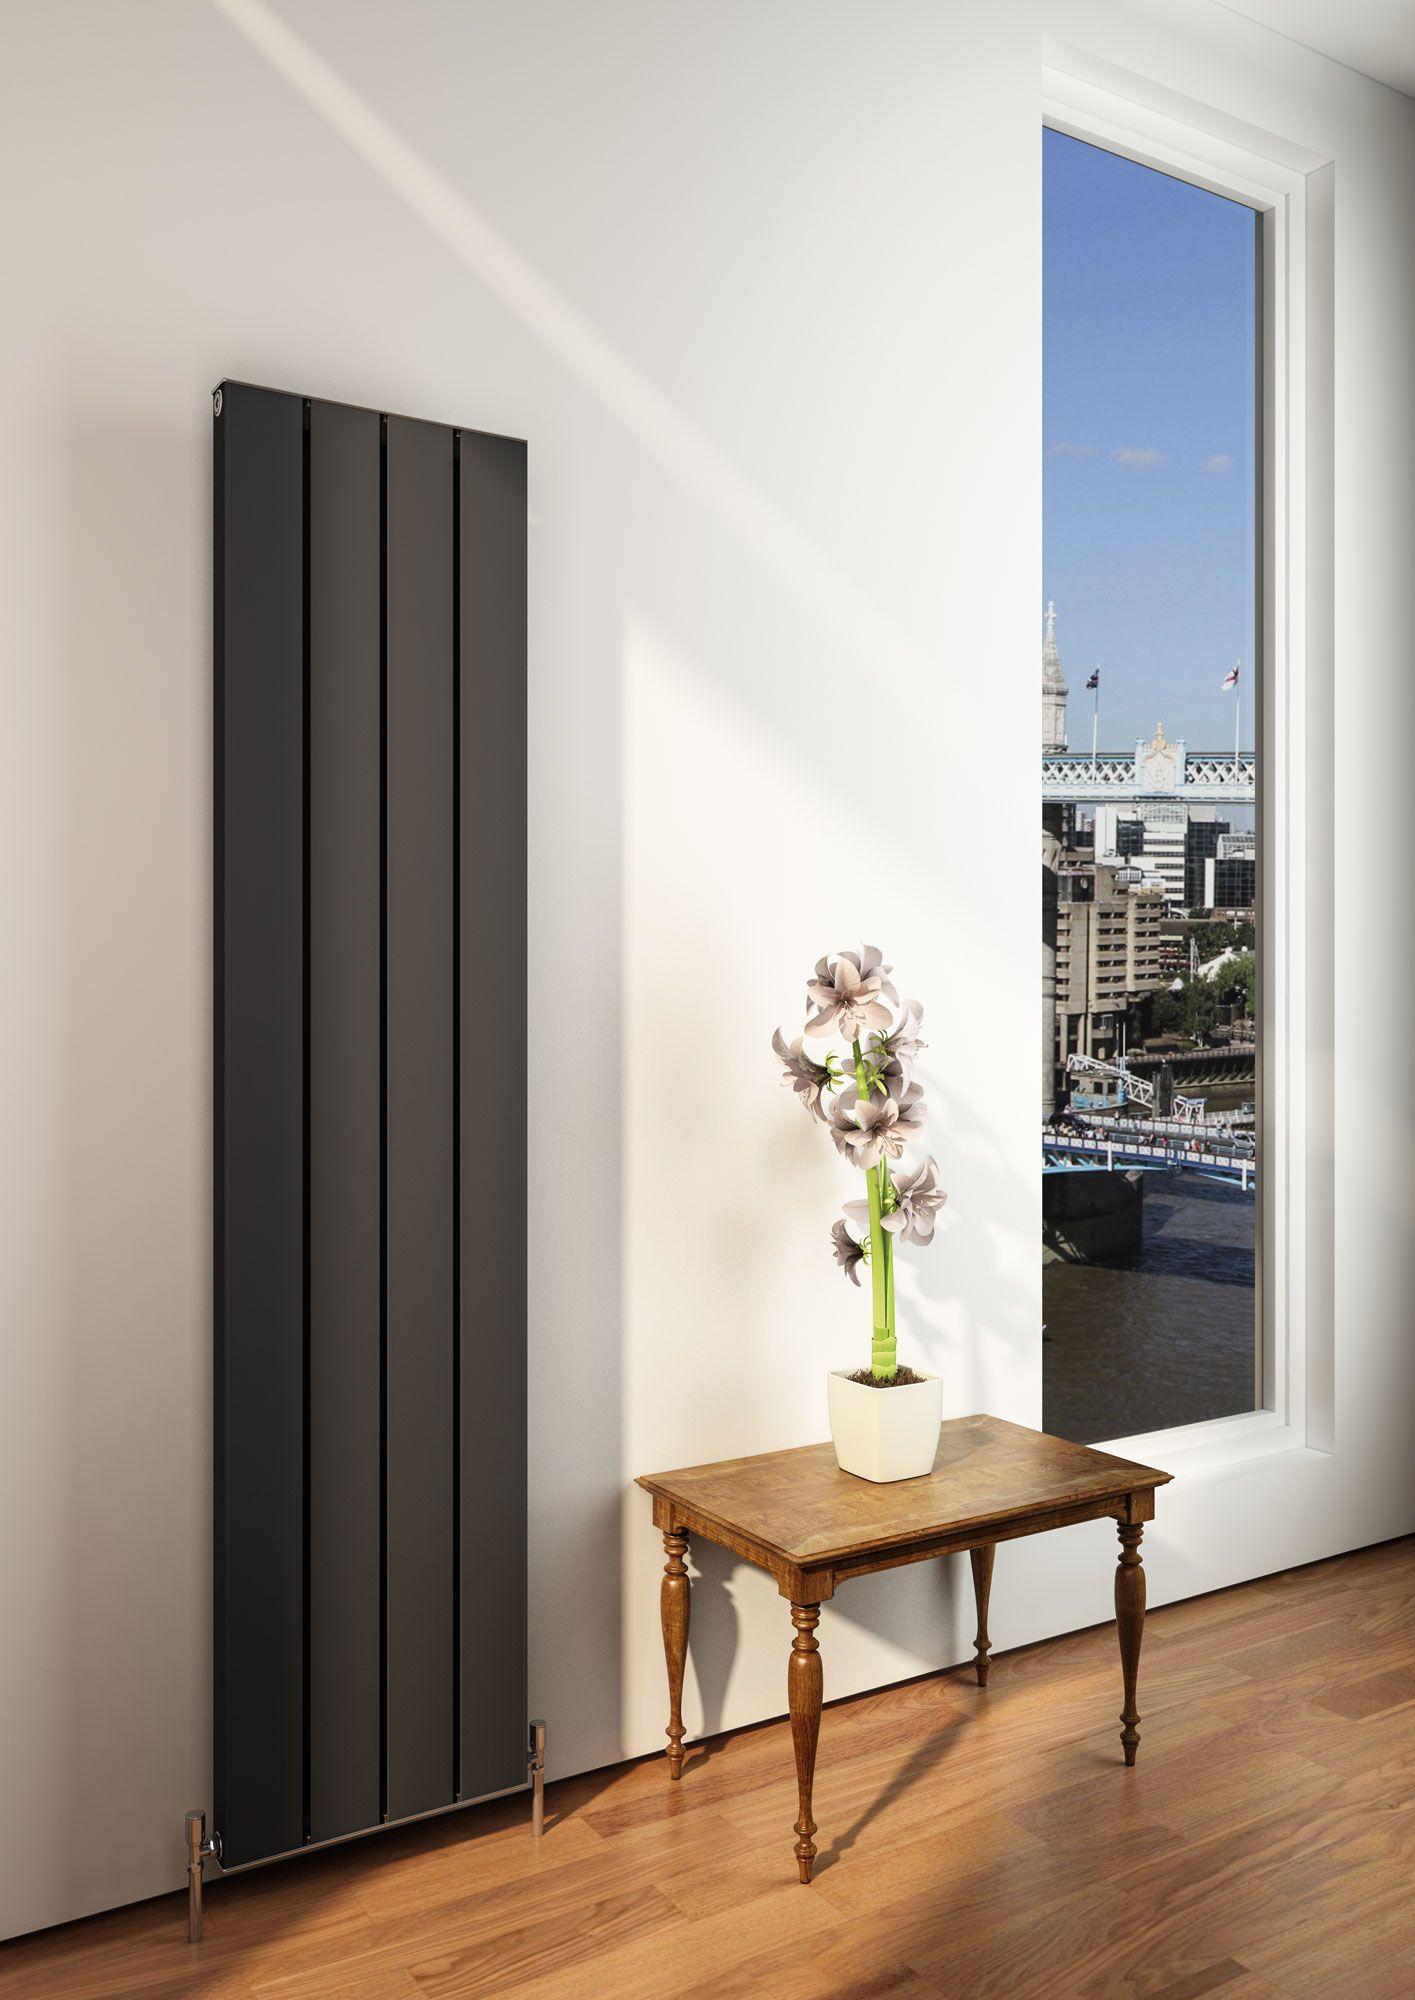 Warm Rooms Cubo Vertical Aluminium Radiator Excellent Heat Conductivity And Lightweight This R Radiator Heating Column Radiators